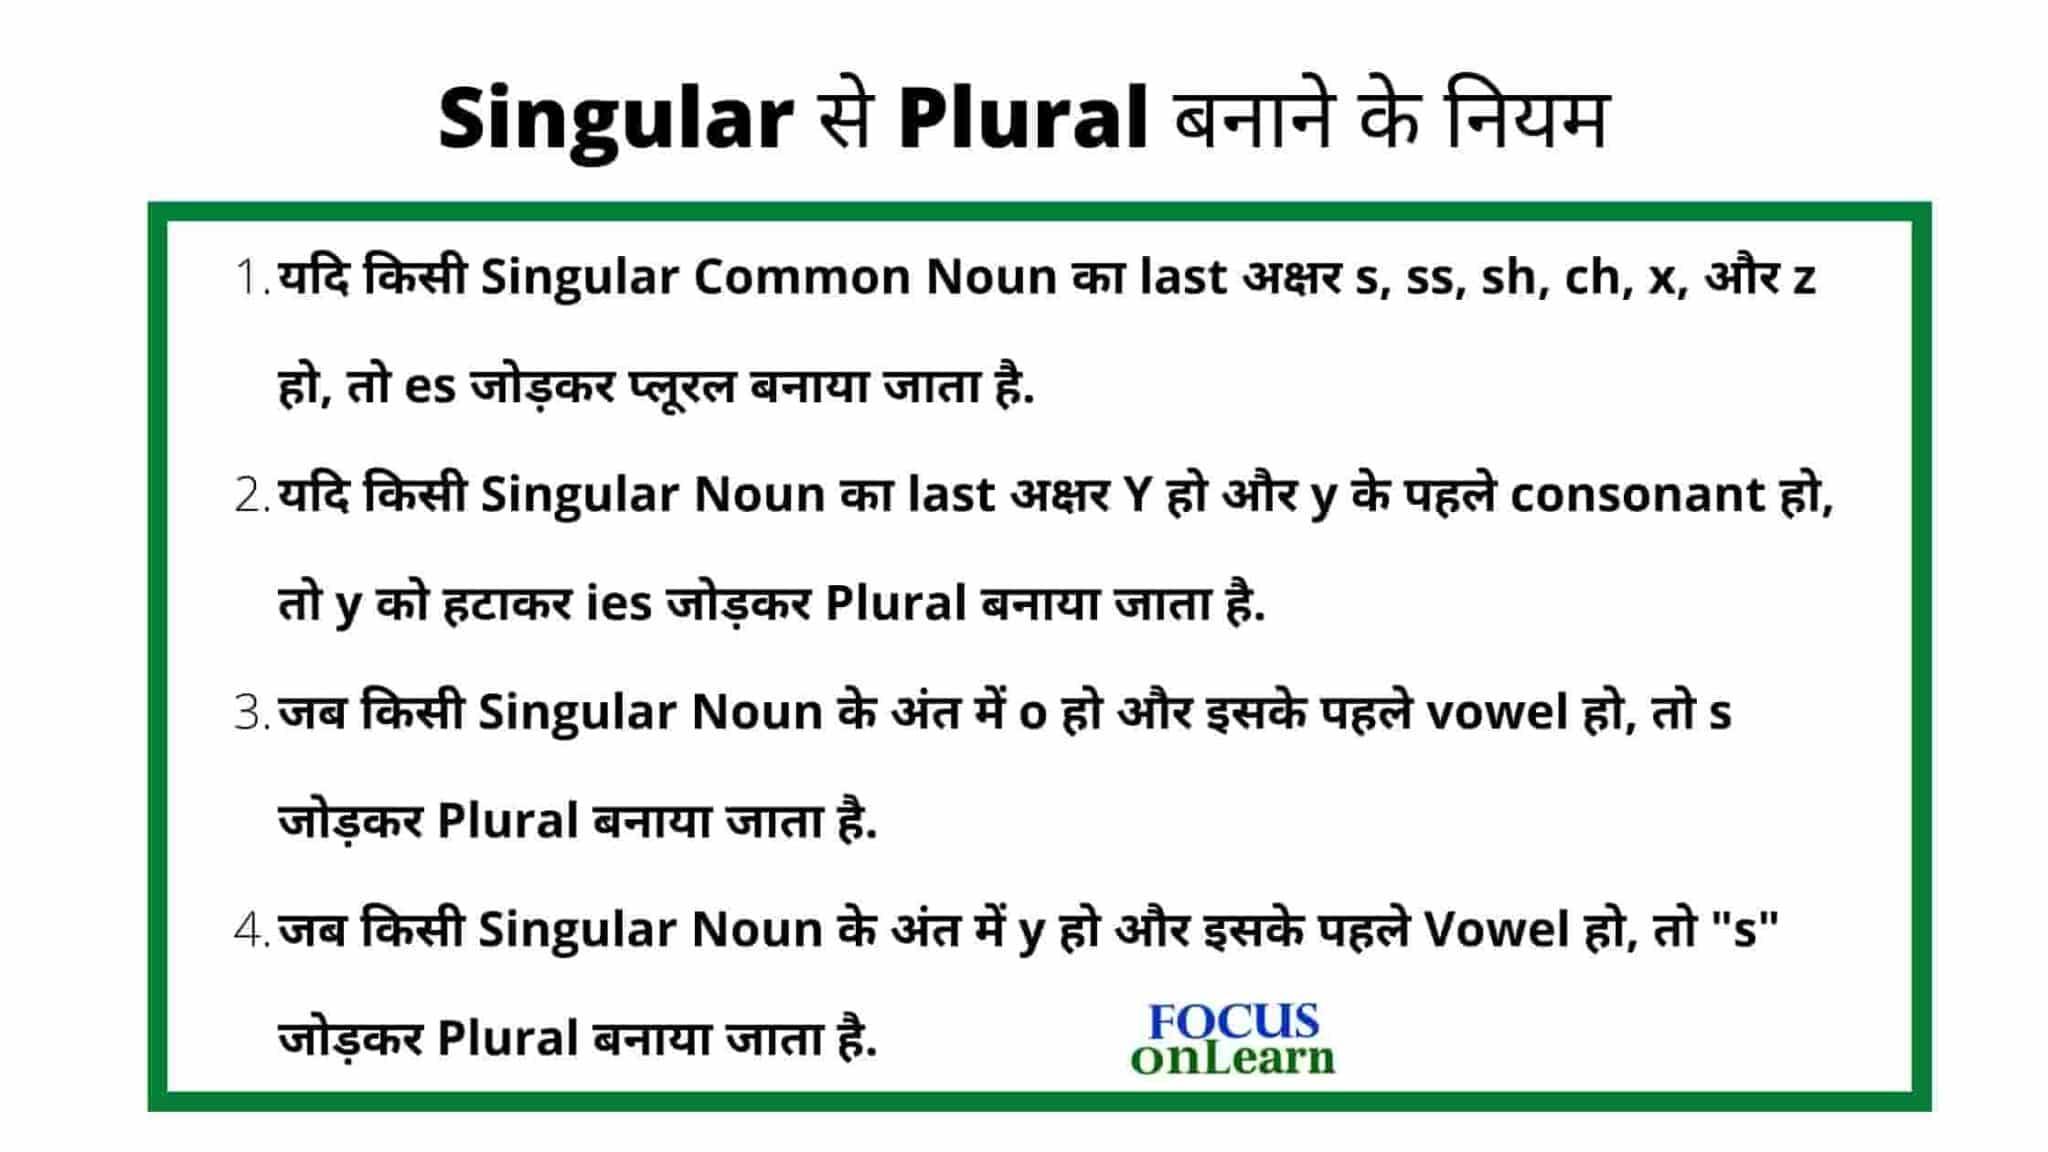 Singular Plural in Hindi